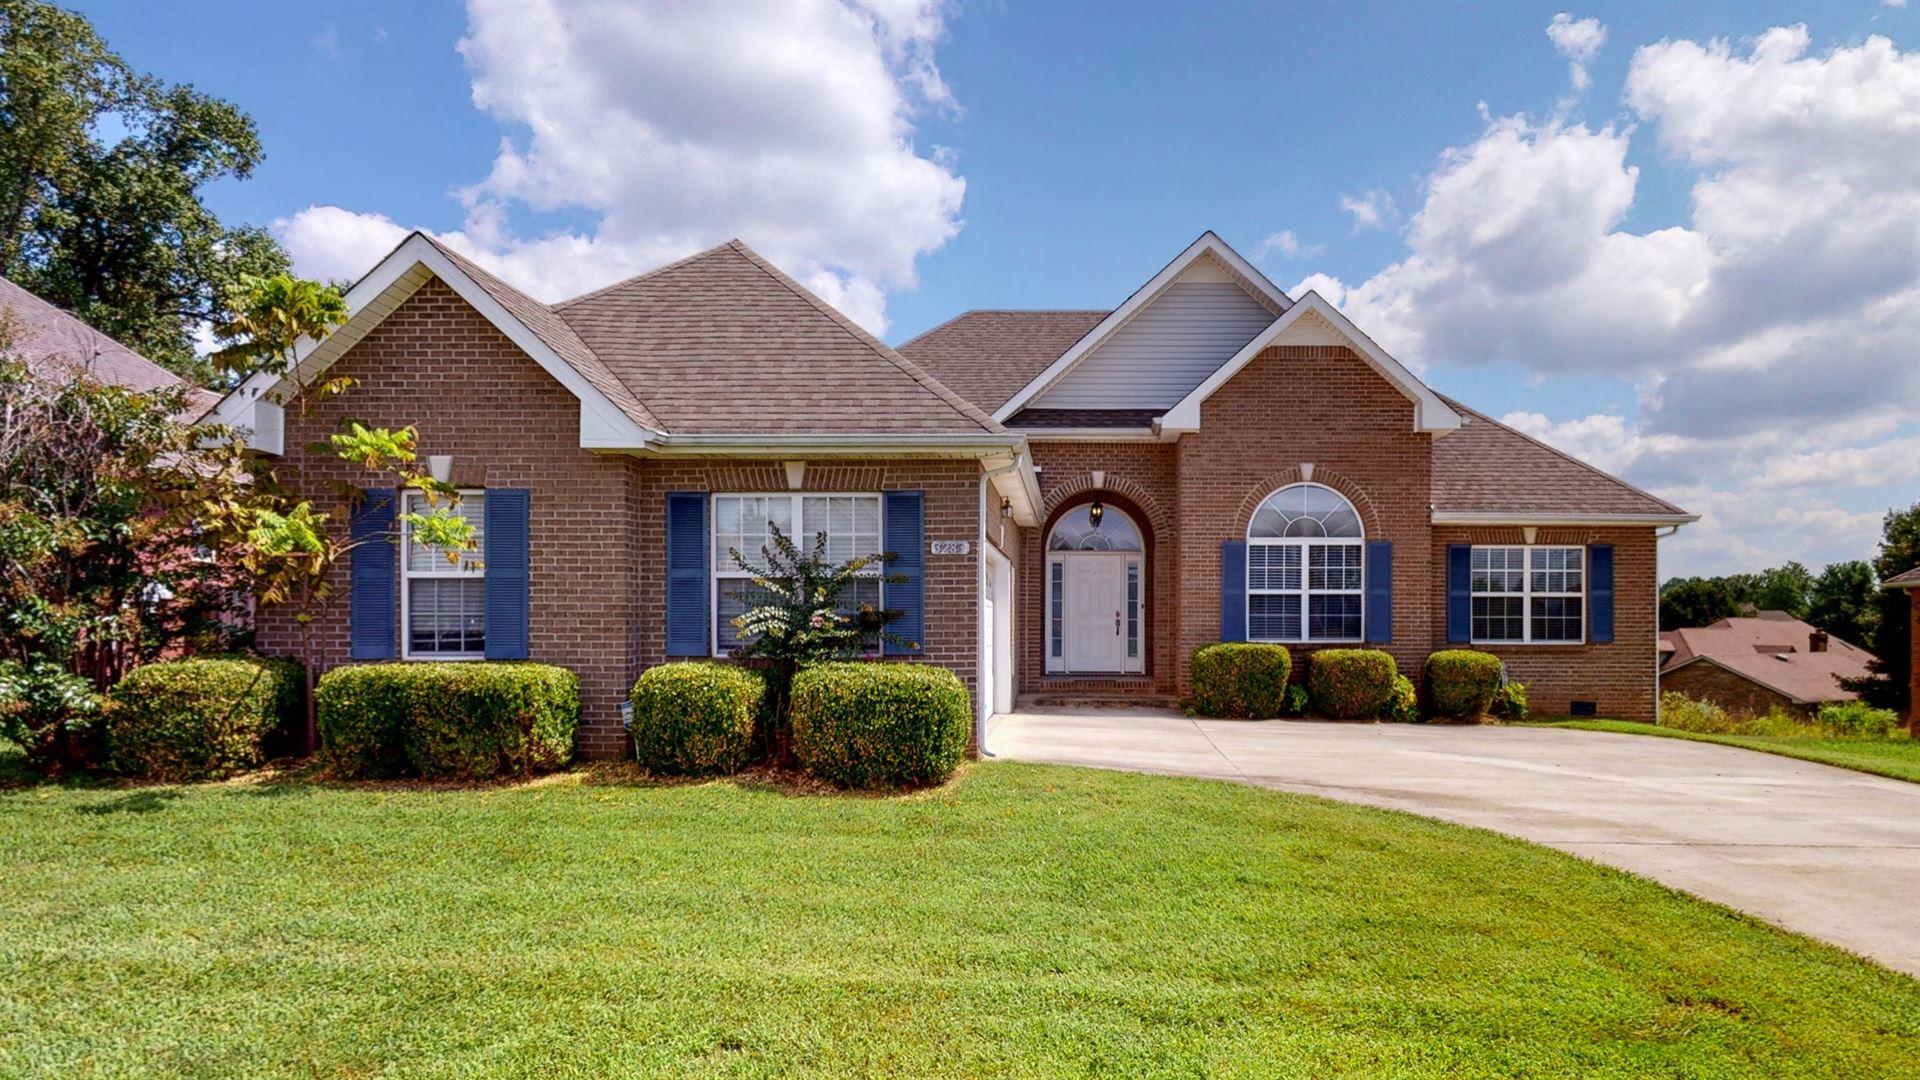 3283 Twelve Oaks Blvd, Clarksville, TN 37042 - MLS#: 2289257